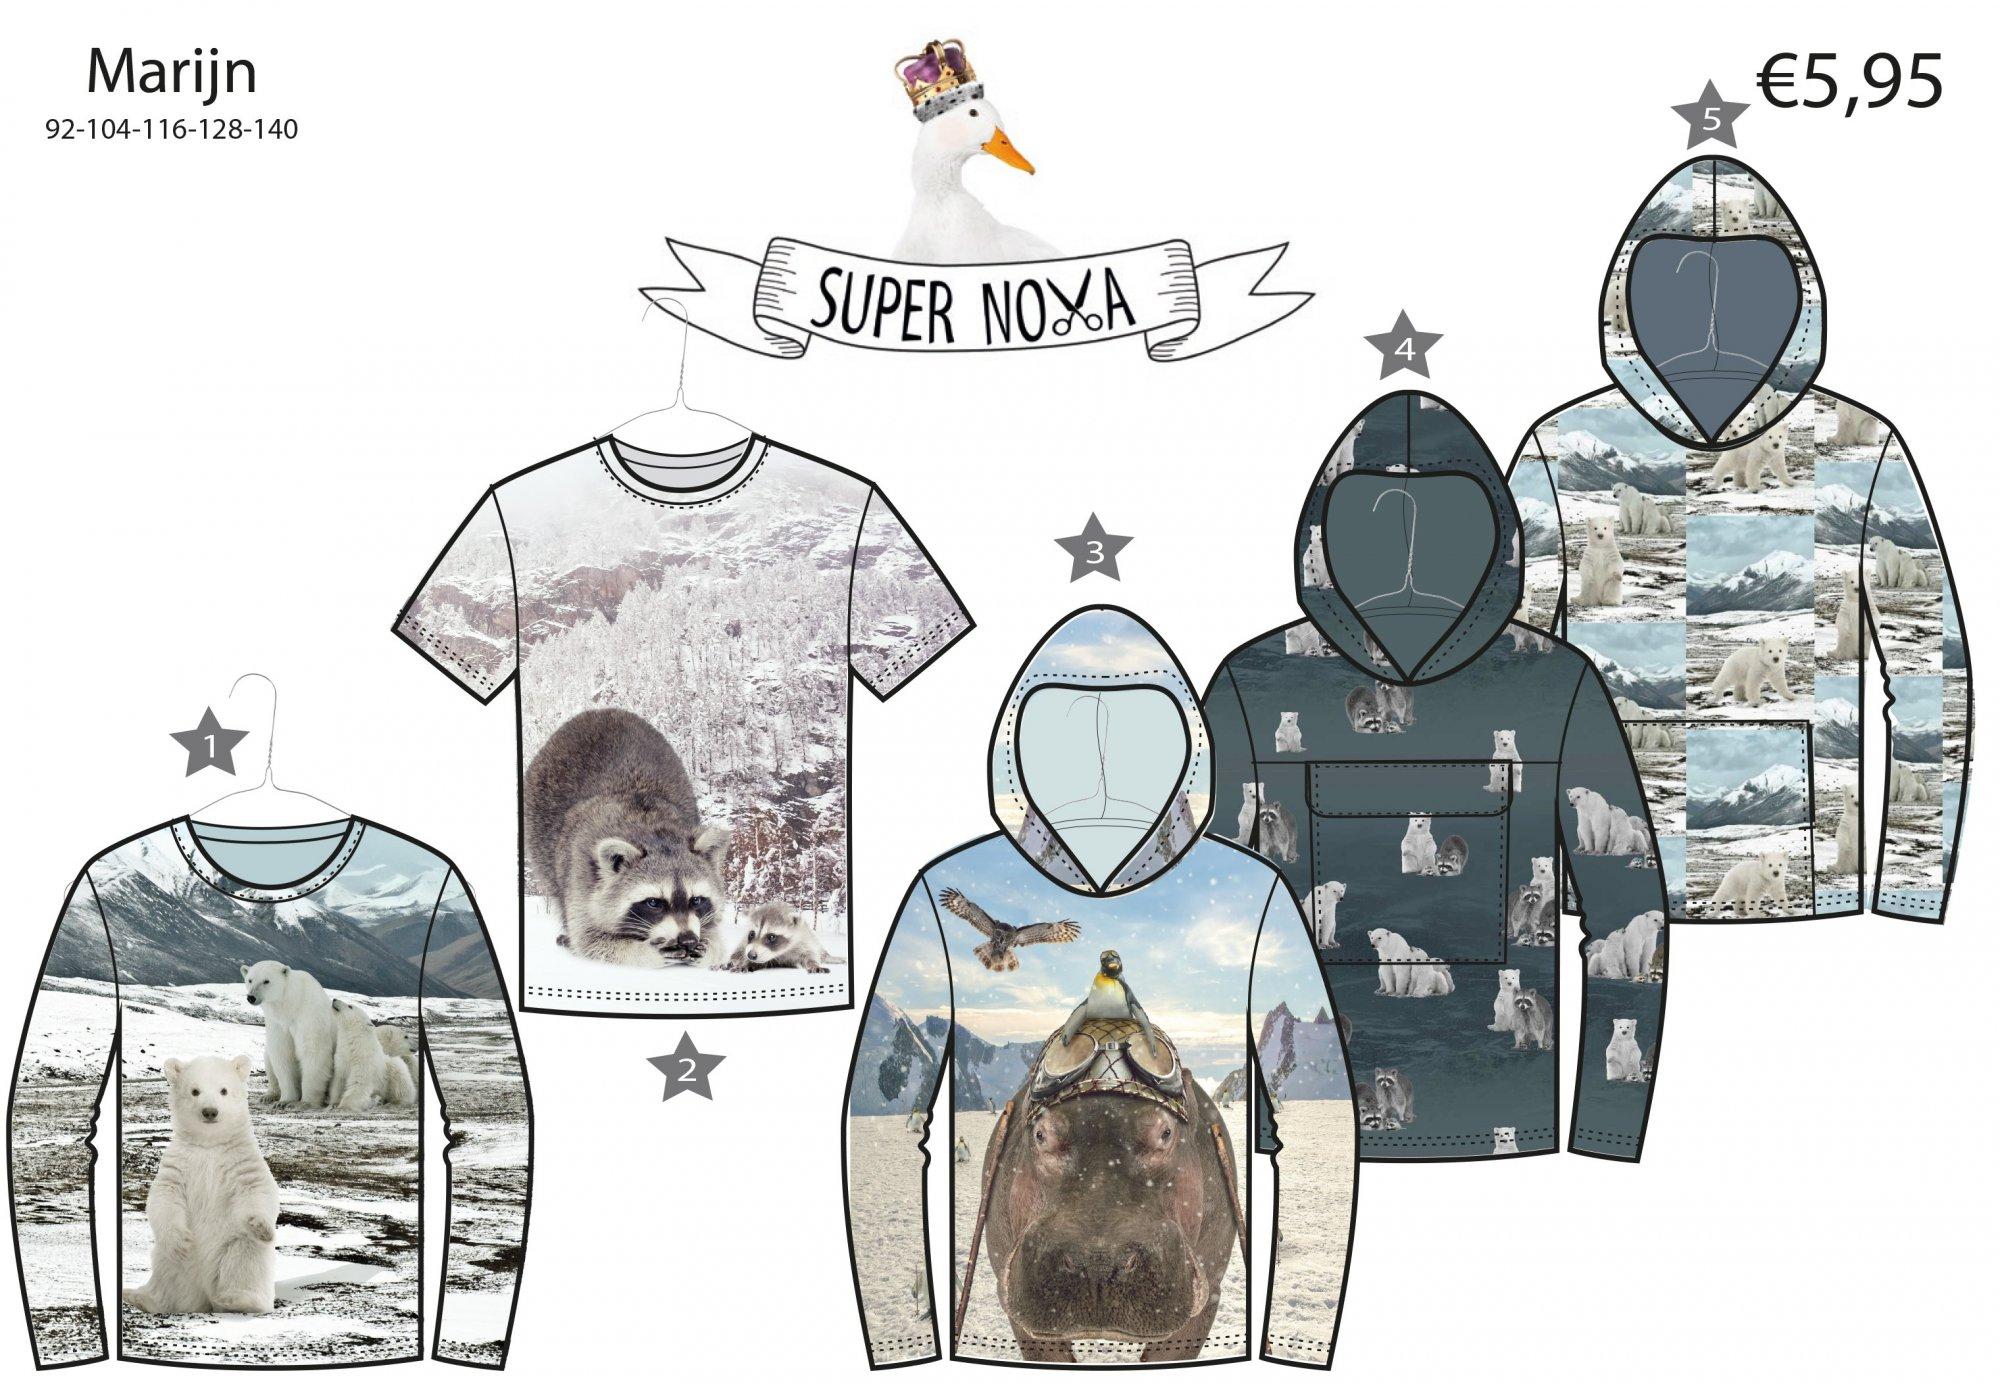 Stenzo Sewing Pattern - Marijn Child's Shirt & Hoody